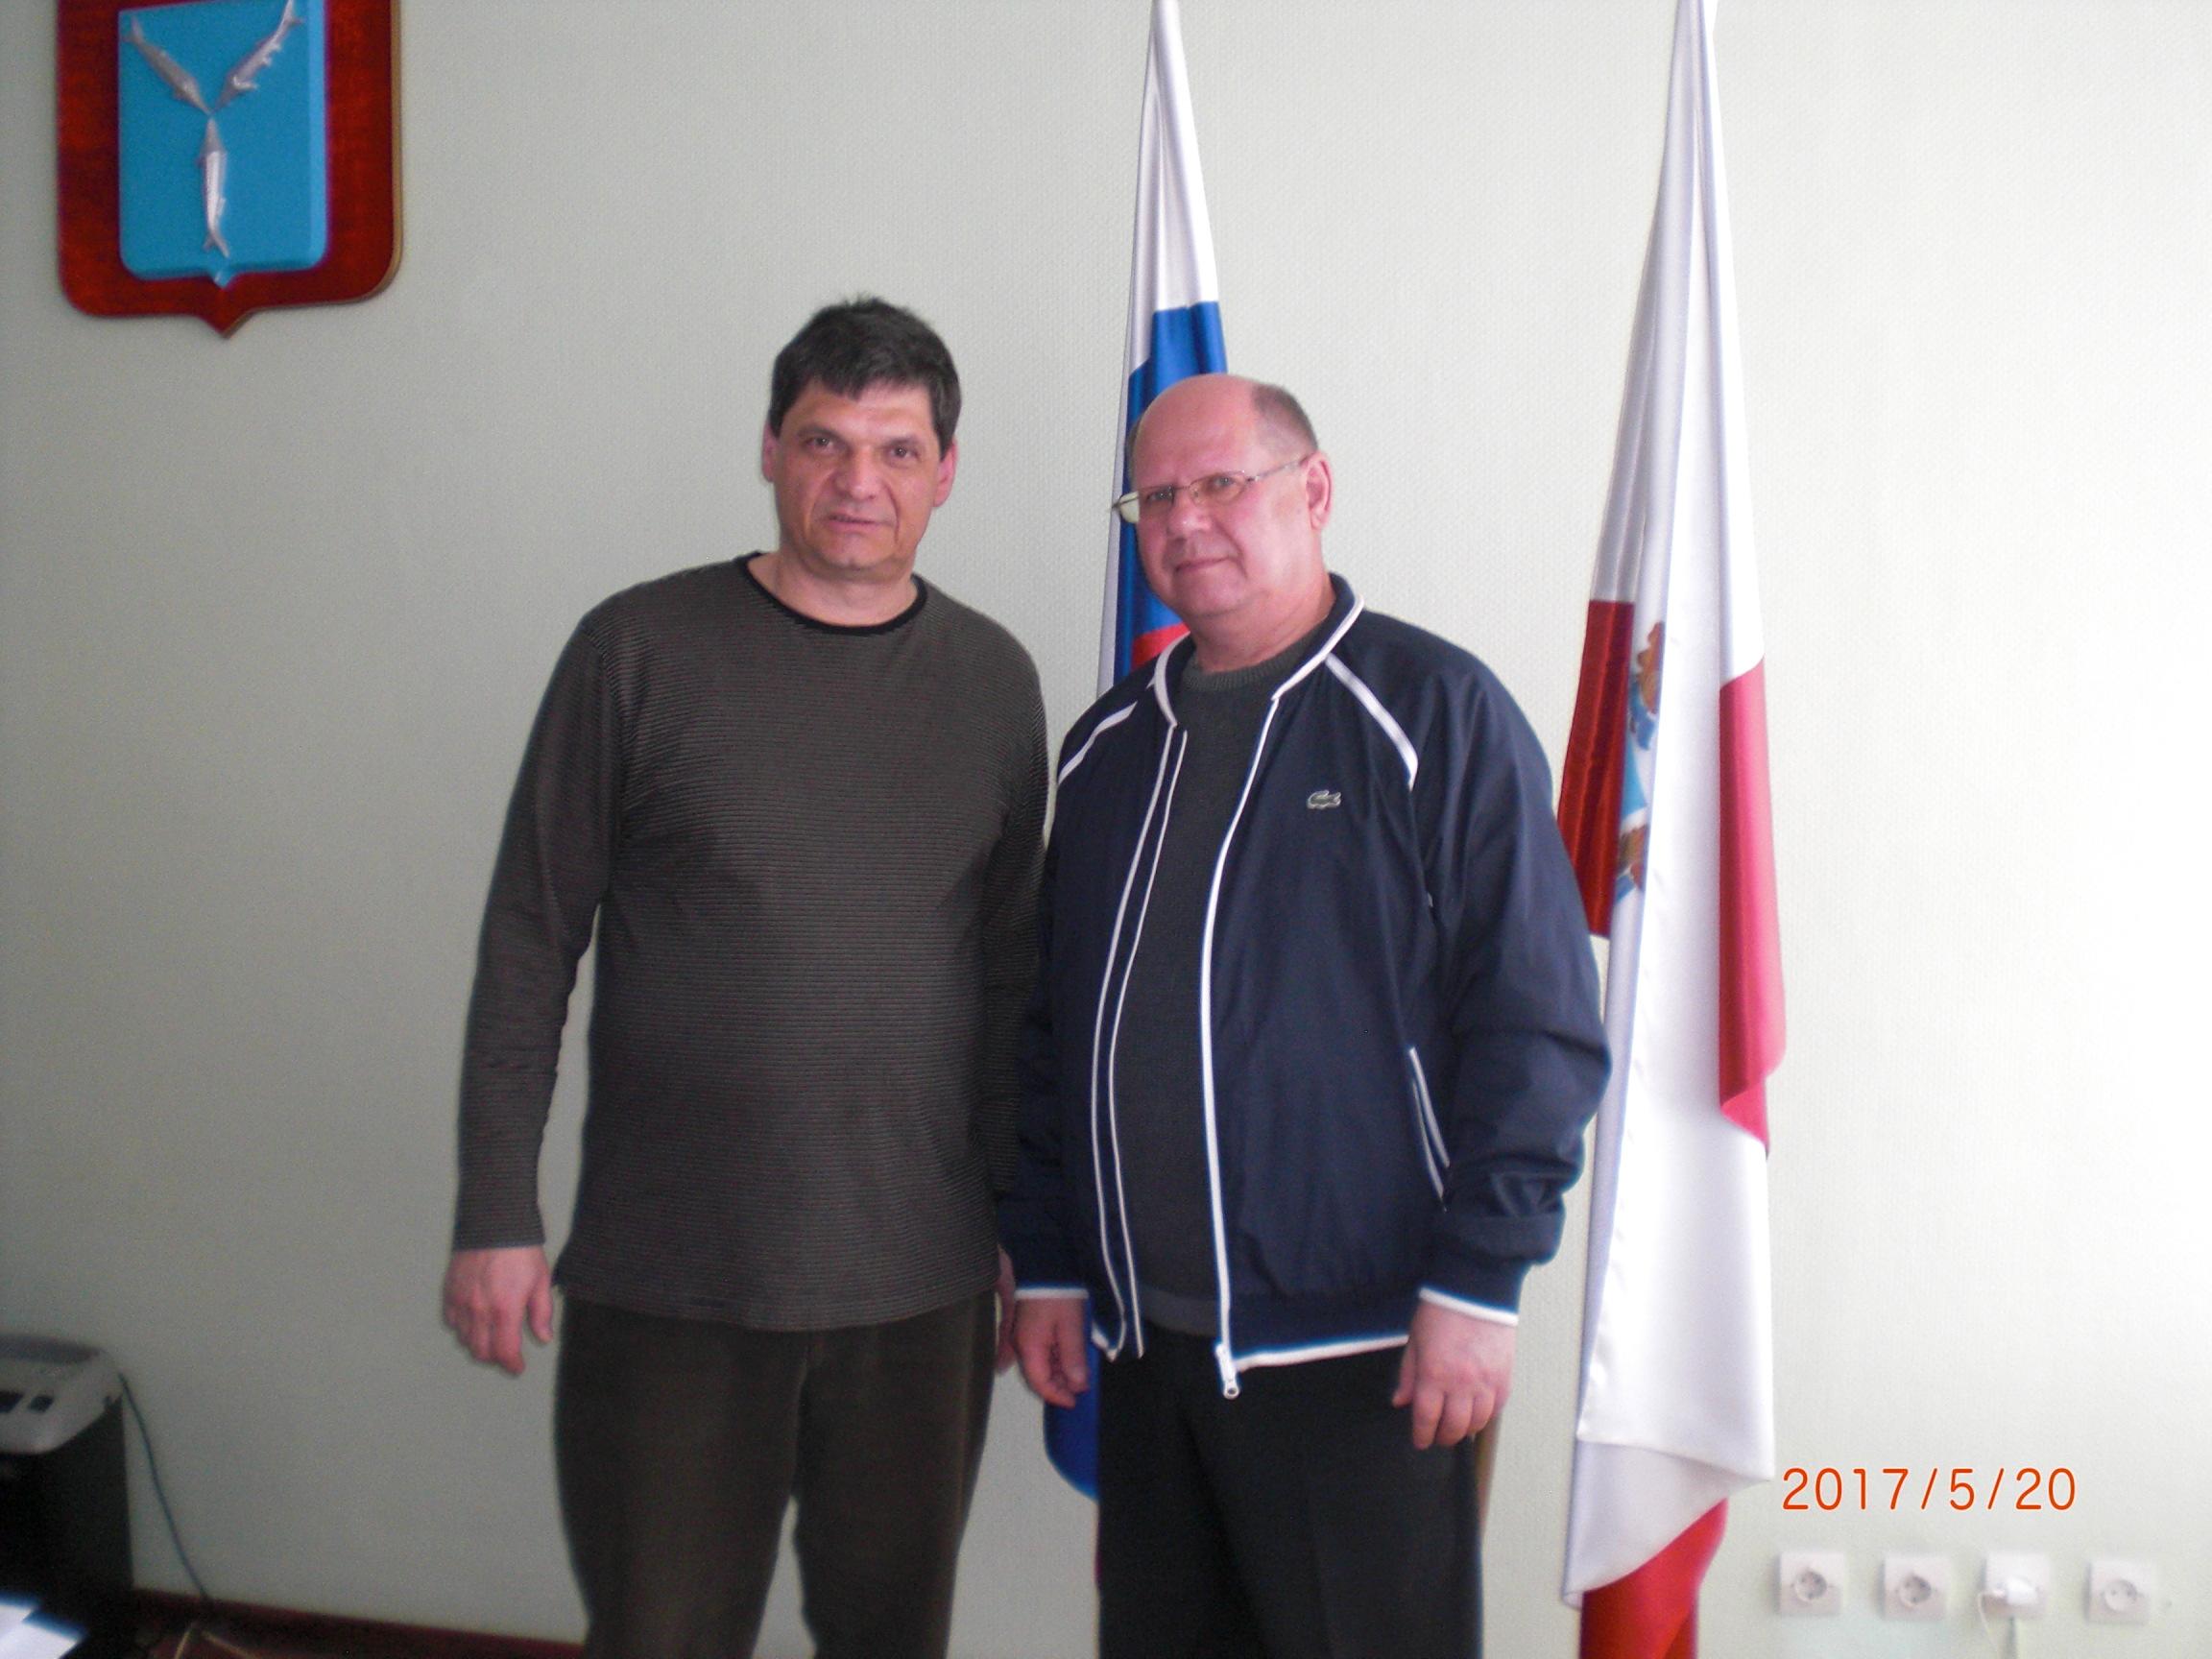 Менякин И.Ю. и Кузьмин И.Г.